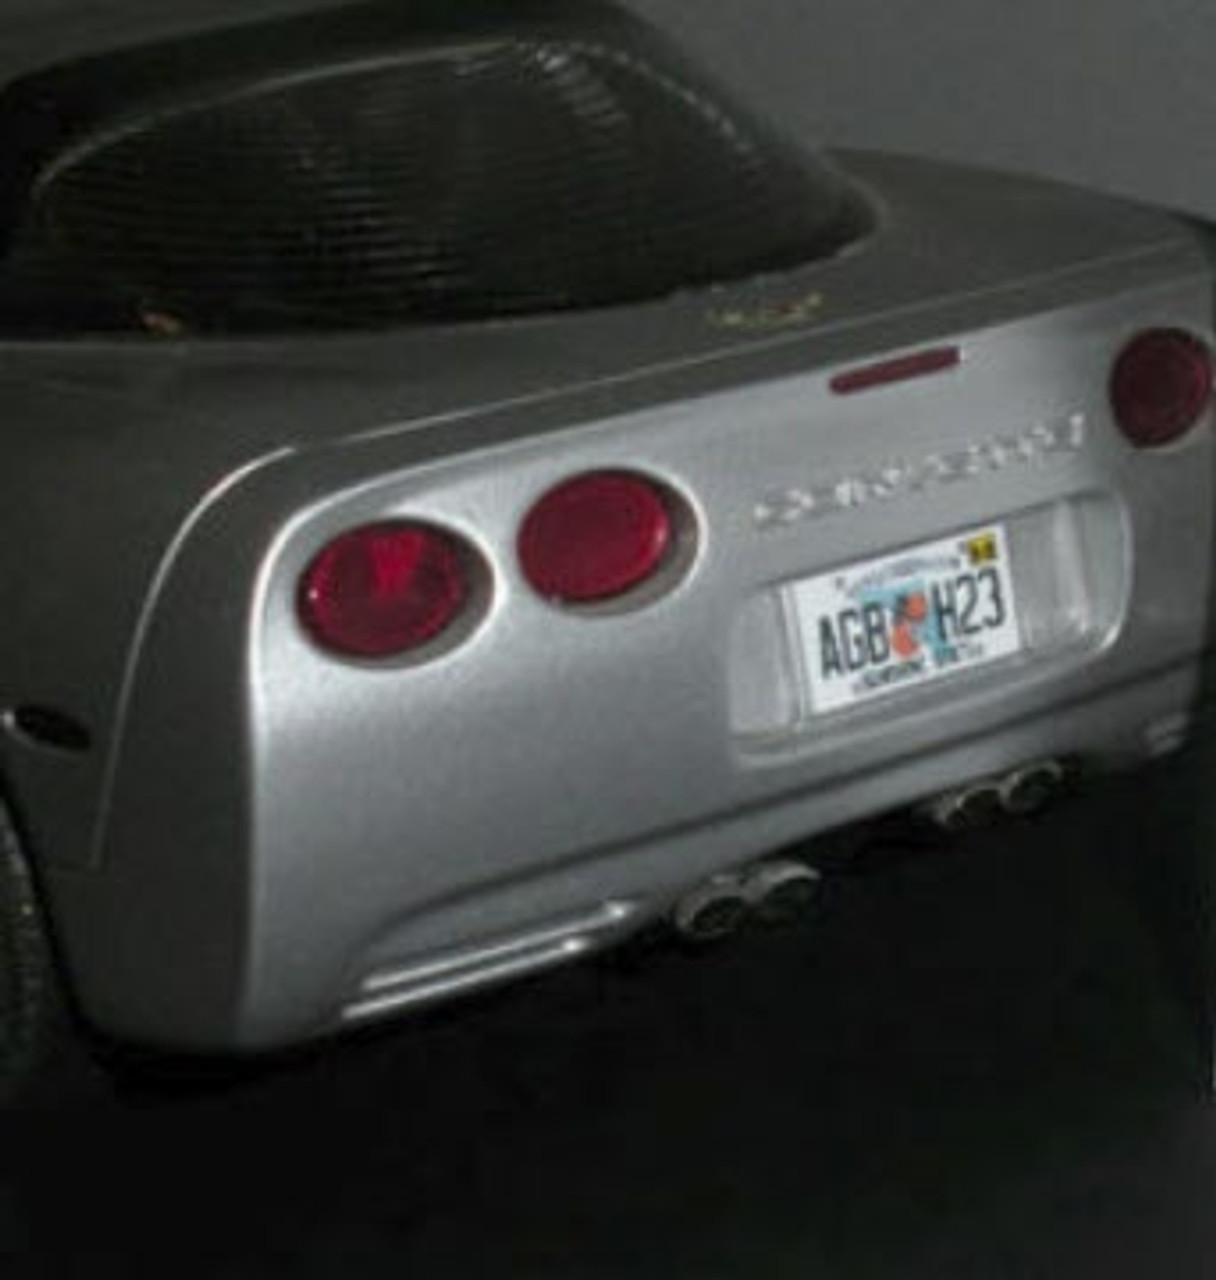 Florida License Plates, Current 1/25